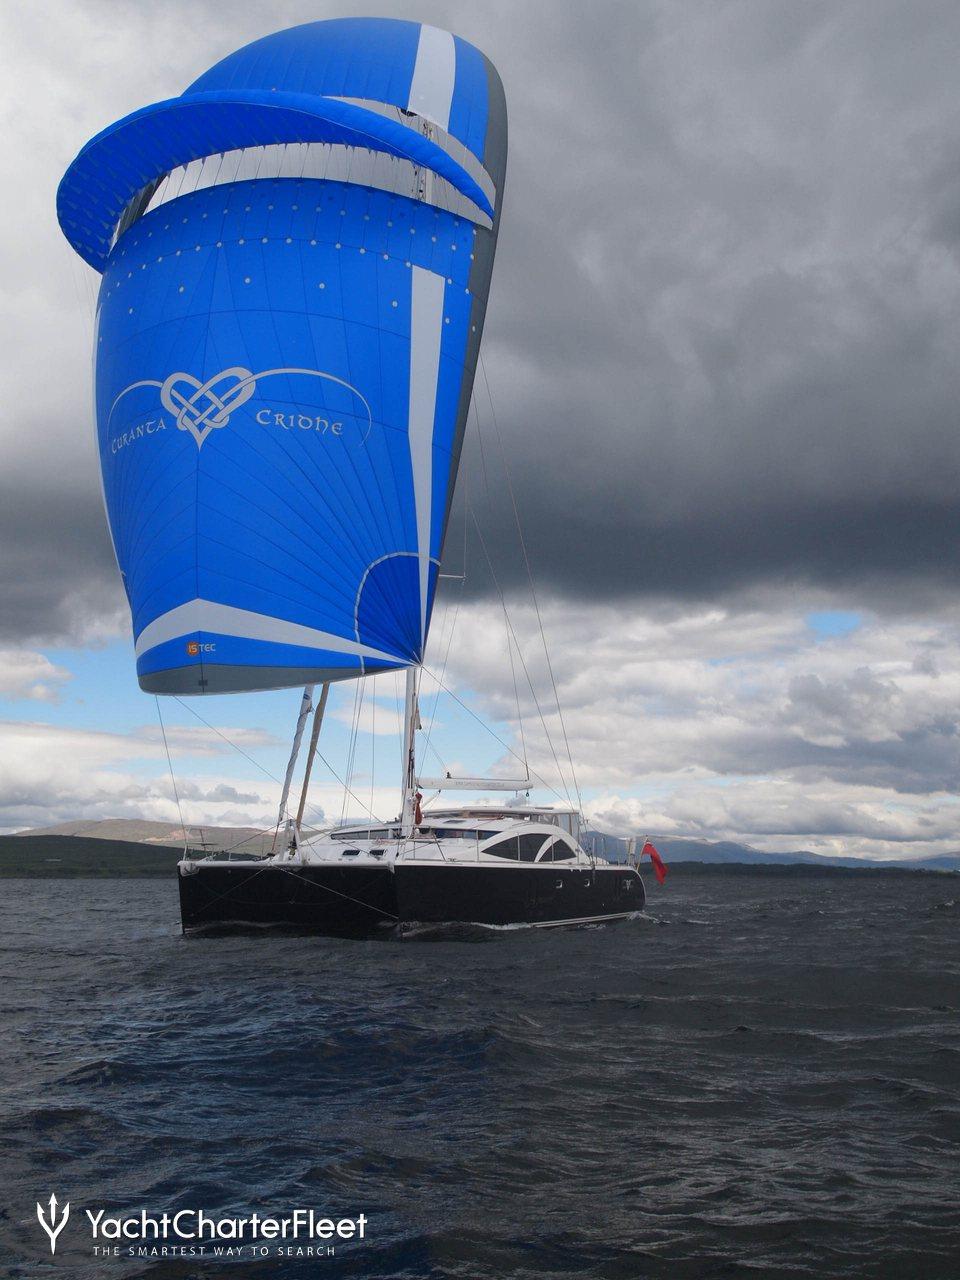 Curanta Cridhe Charter Yacht